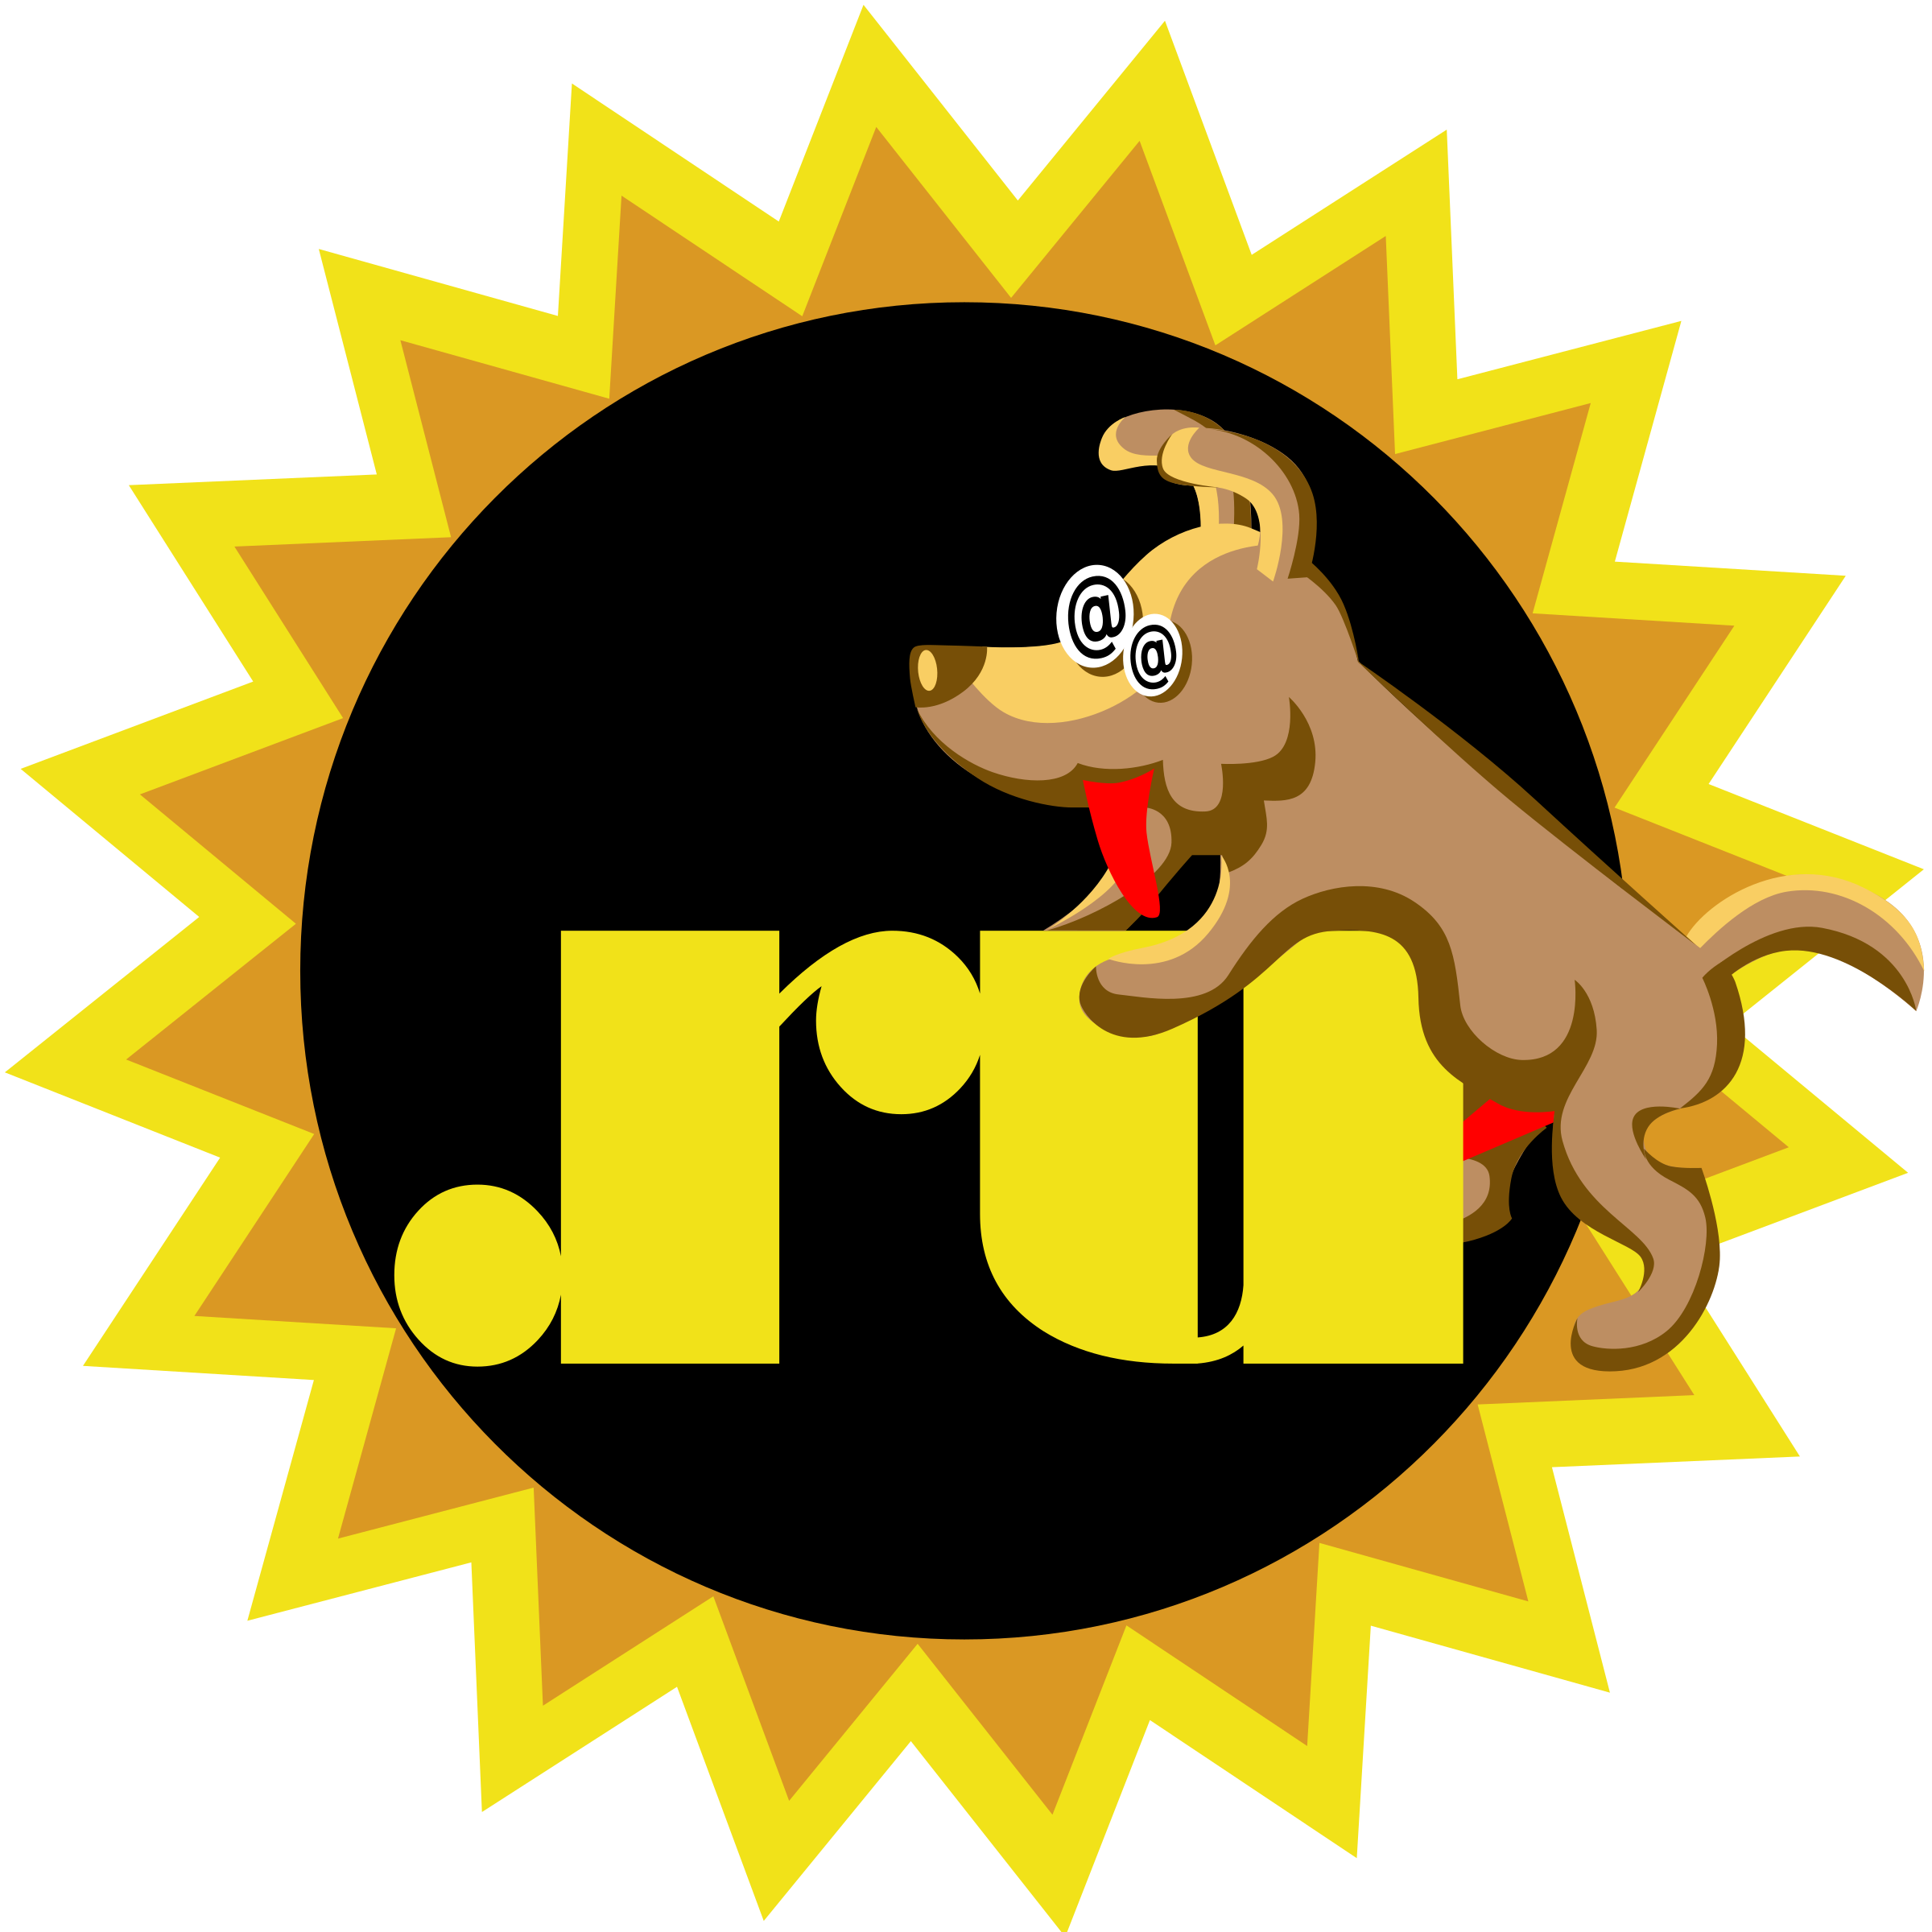 Crazy dog clipart svg free Clipart - Dog.ru svg free